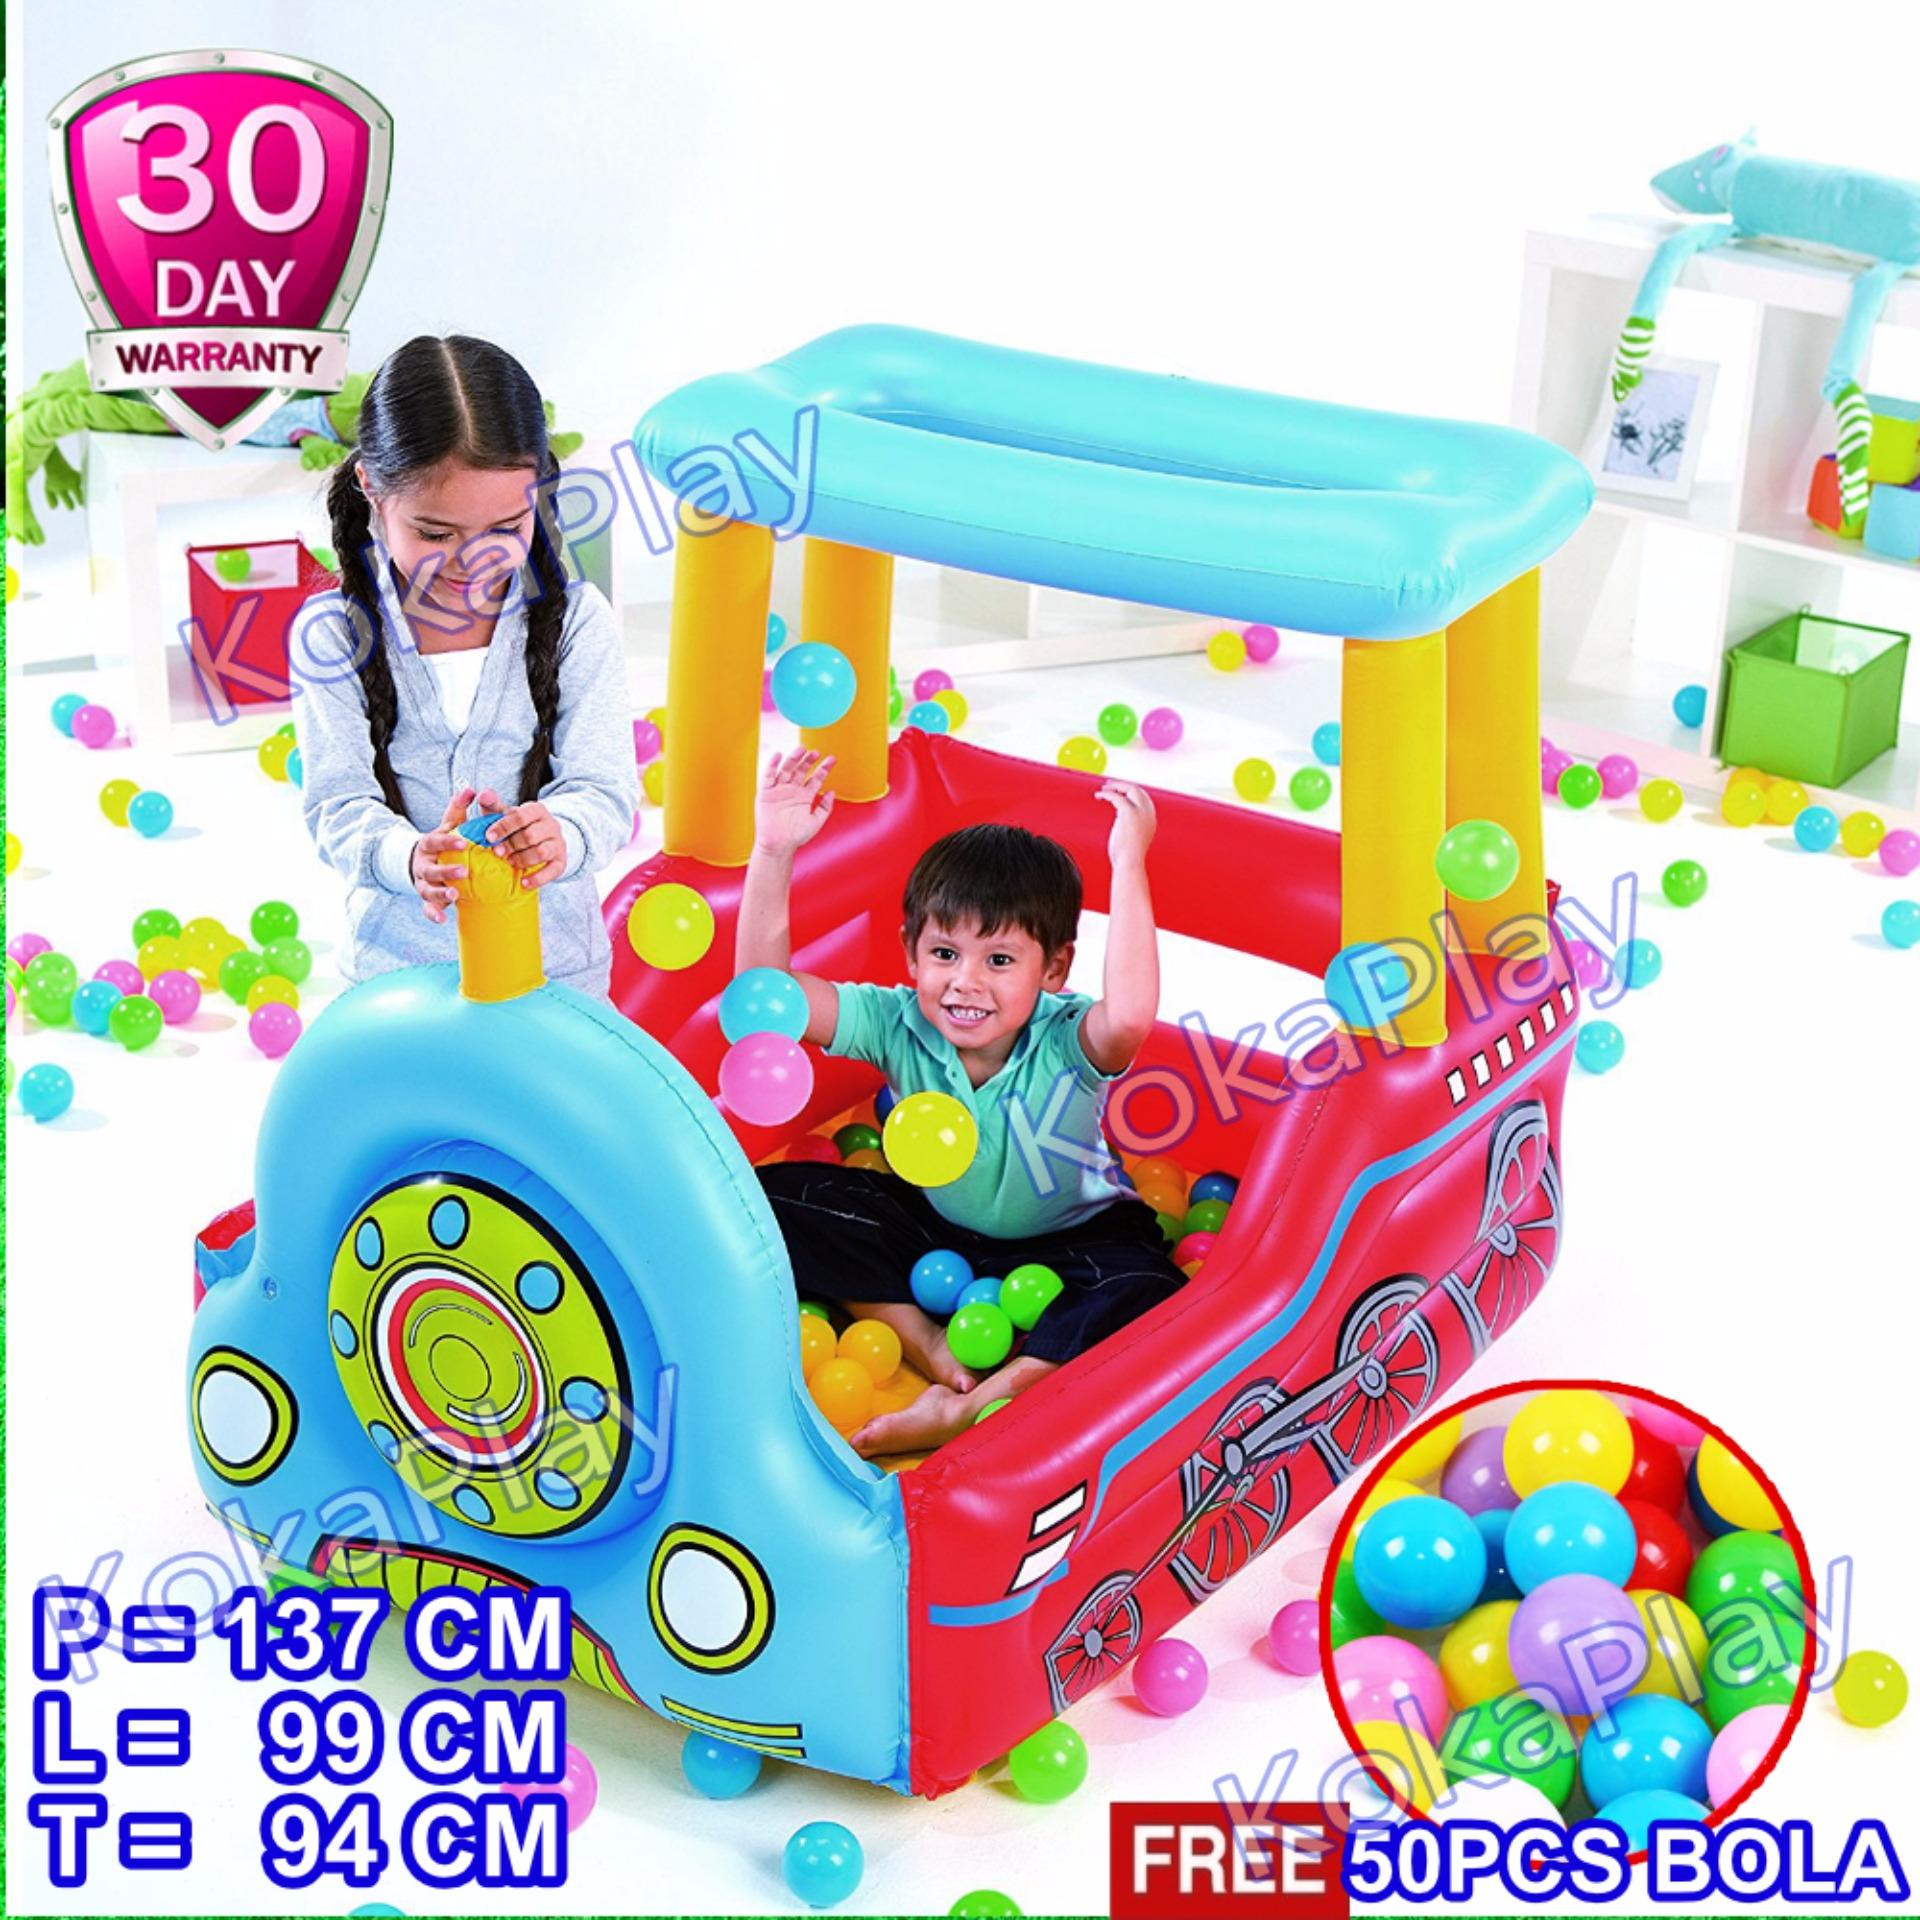 Shopping Comparison Bestway Inflatable Train Play Center Ball Pool Mainan Pelampung Mobil Mobilan Kereta Api Kolam Bola + Free 50pcs Bola